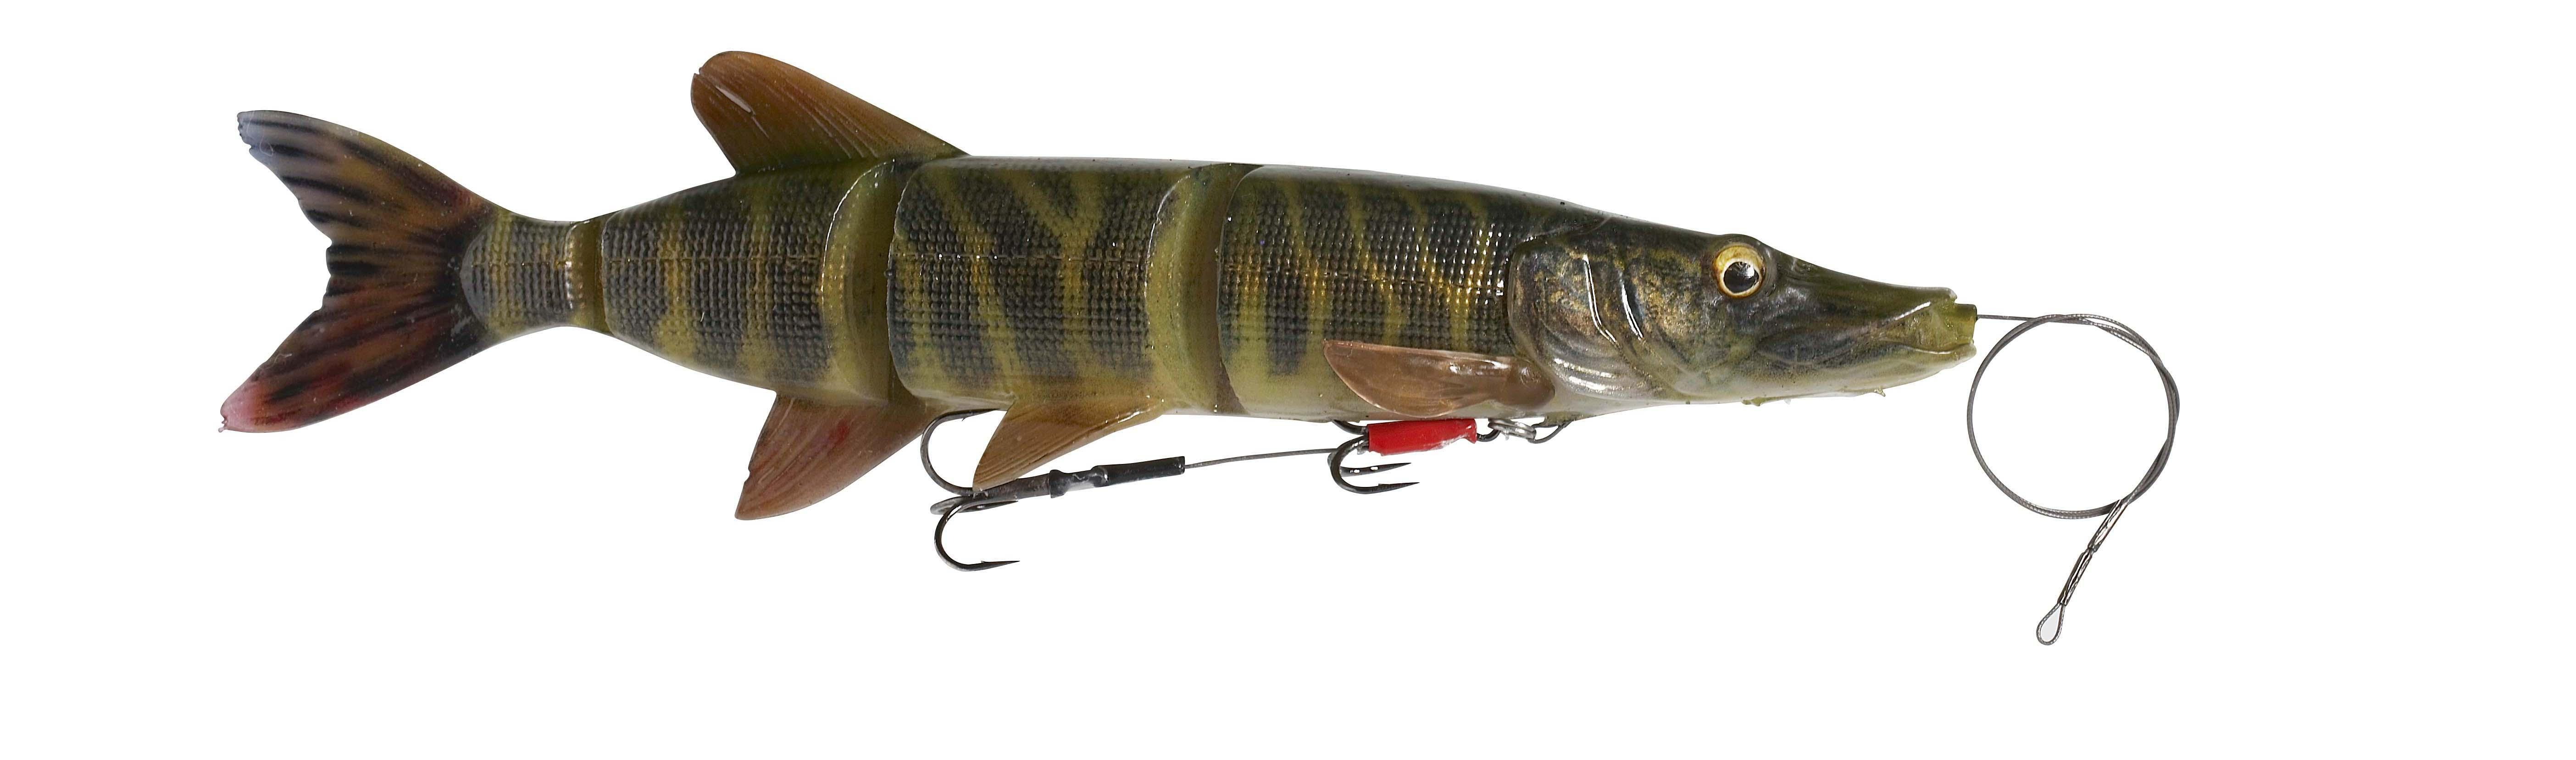 Striped Pike